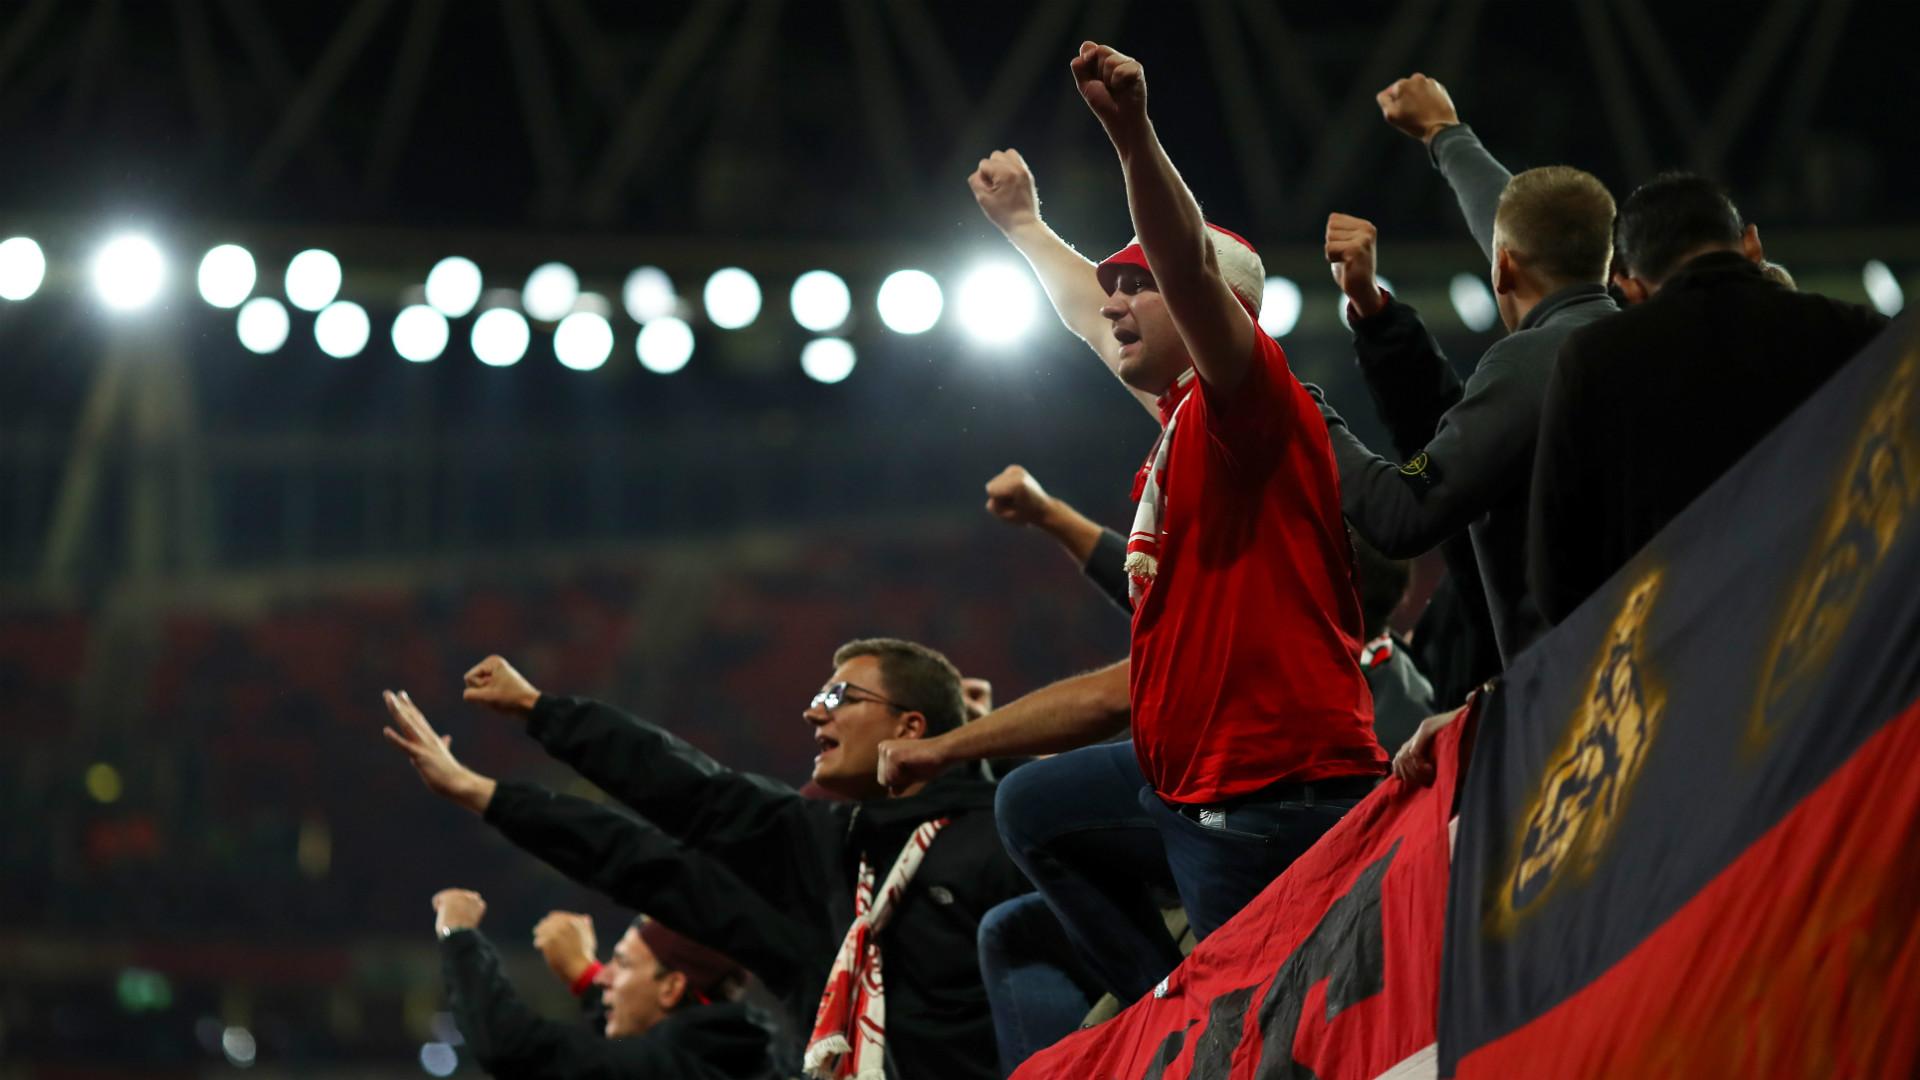 koln fans arsenal europa league_44igdh3eat0g1edgtm8thl0rejpgt 2117584202quality100